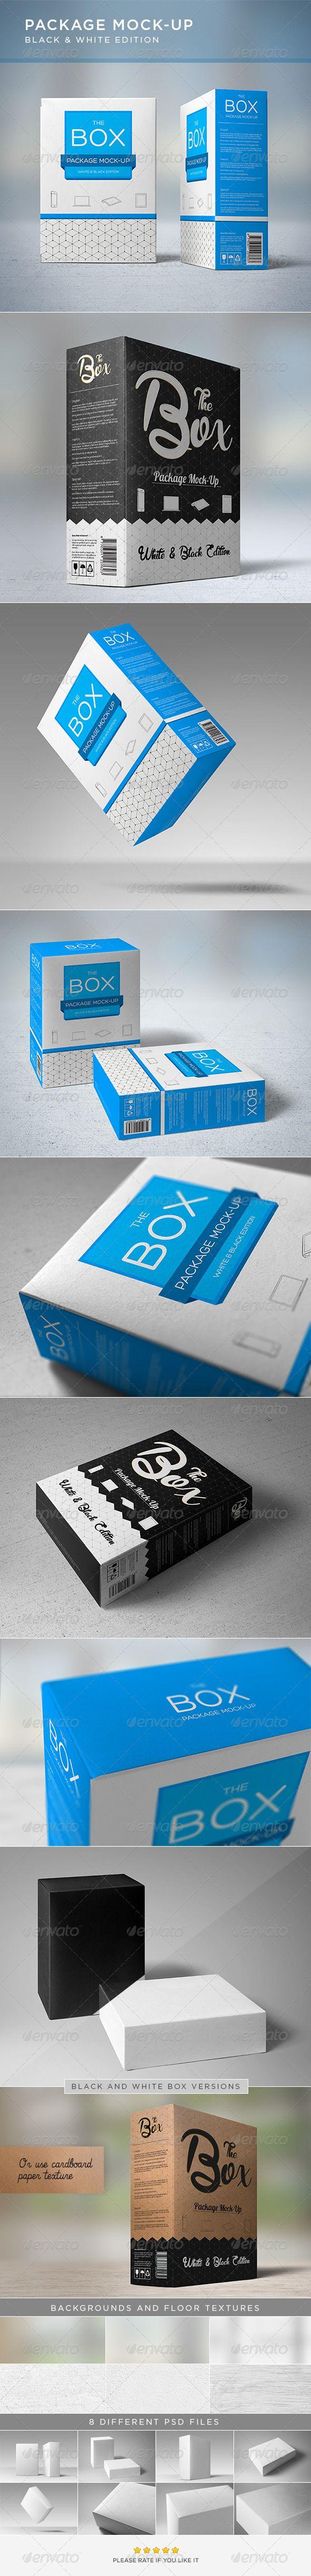 Download Package Mock Up Packaging Template Design Graphic Design Mockup Packaging Design